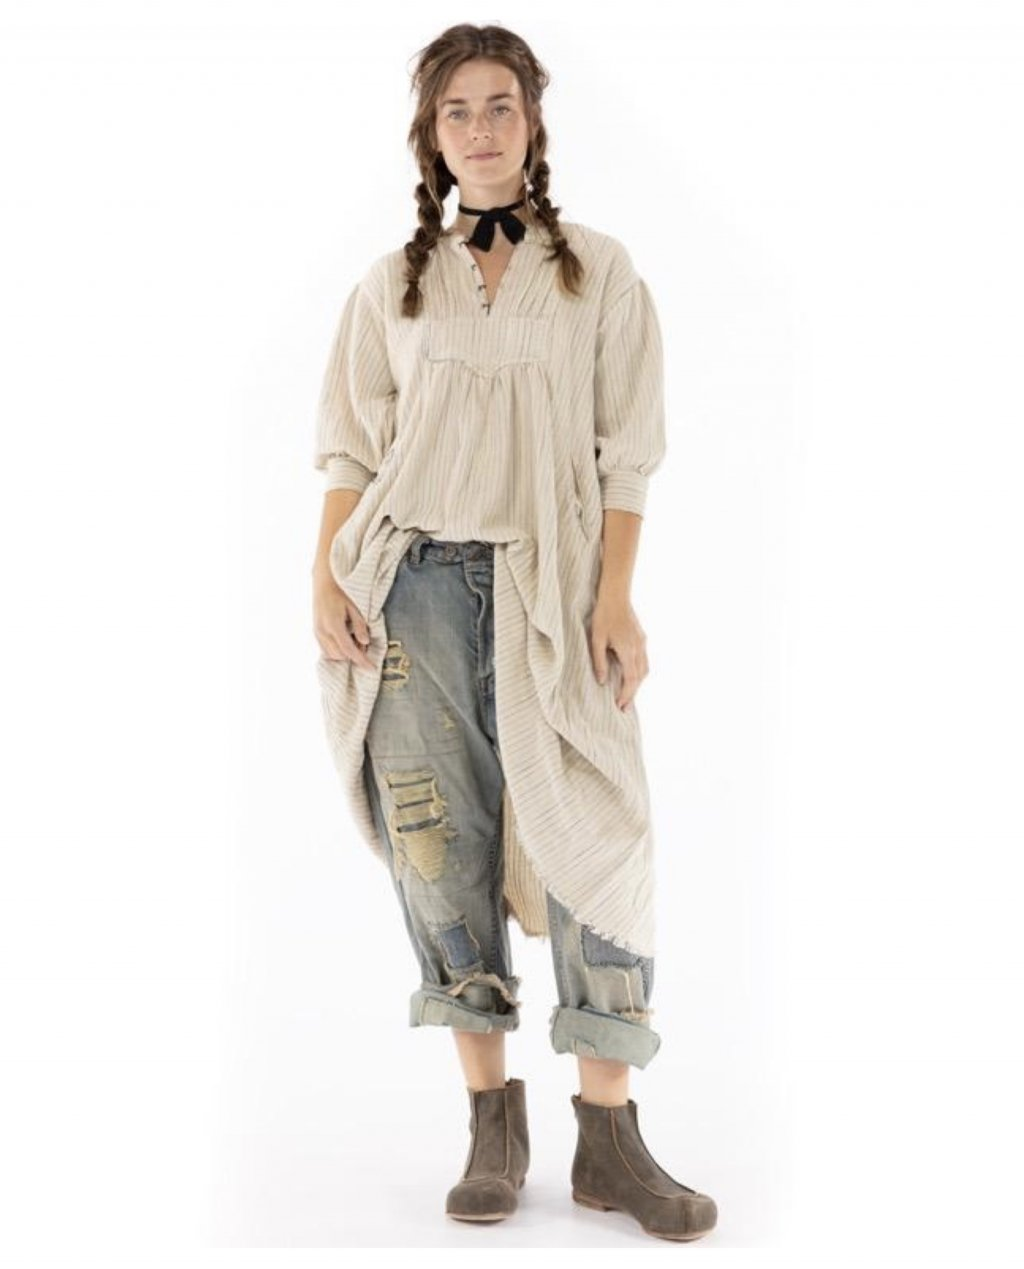 Magnolia Pearl | Bibby Dress | Woven Cotton | Little Shell